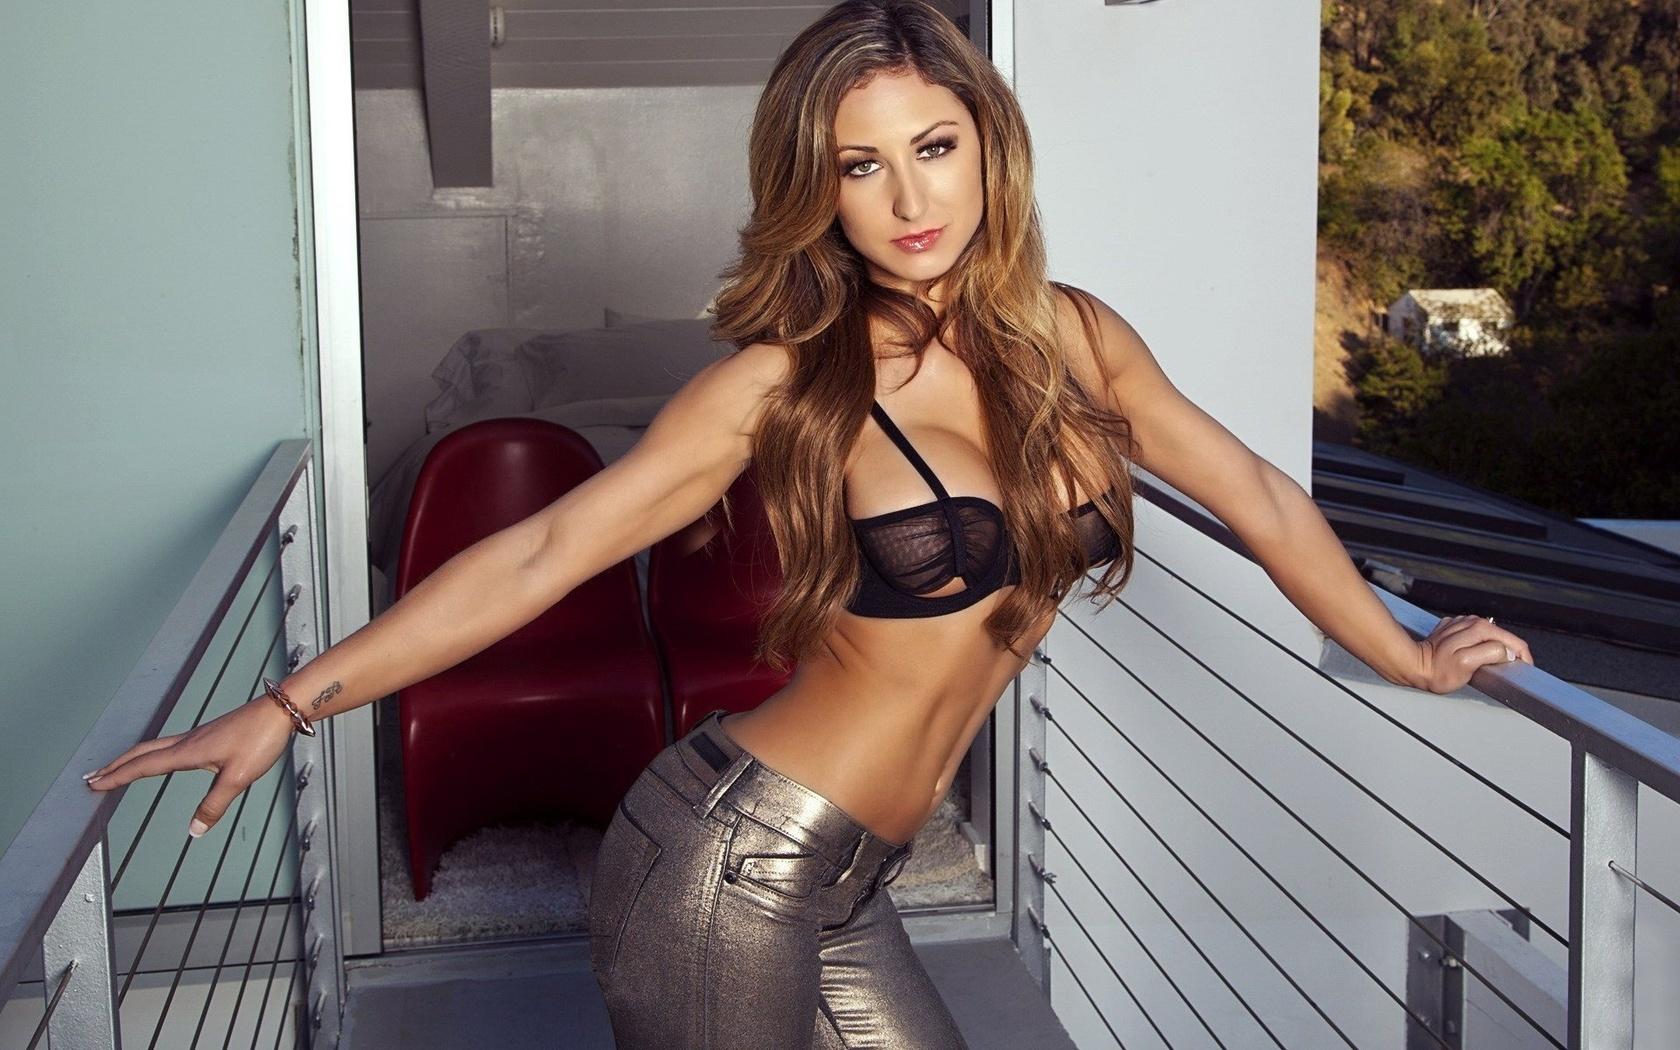 jessie cabanne, модель, грудь, взгляд